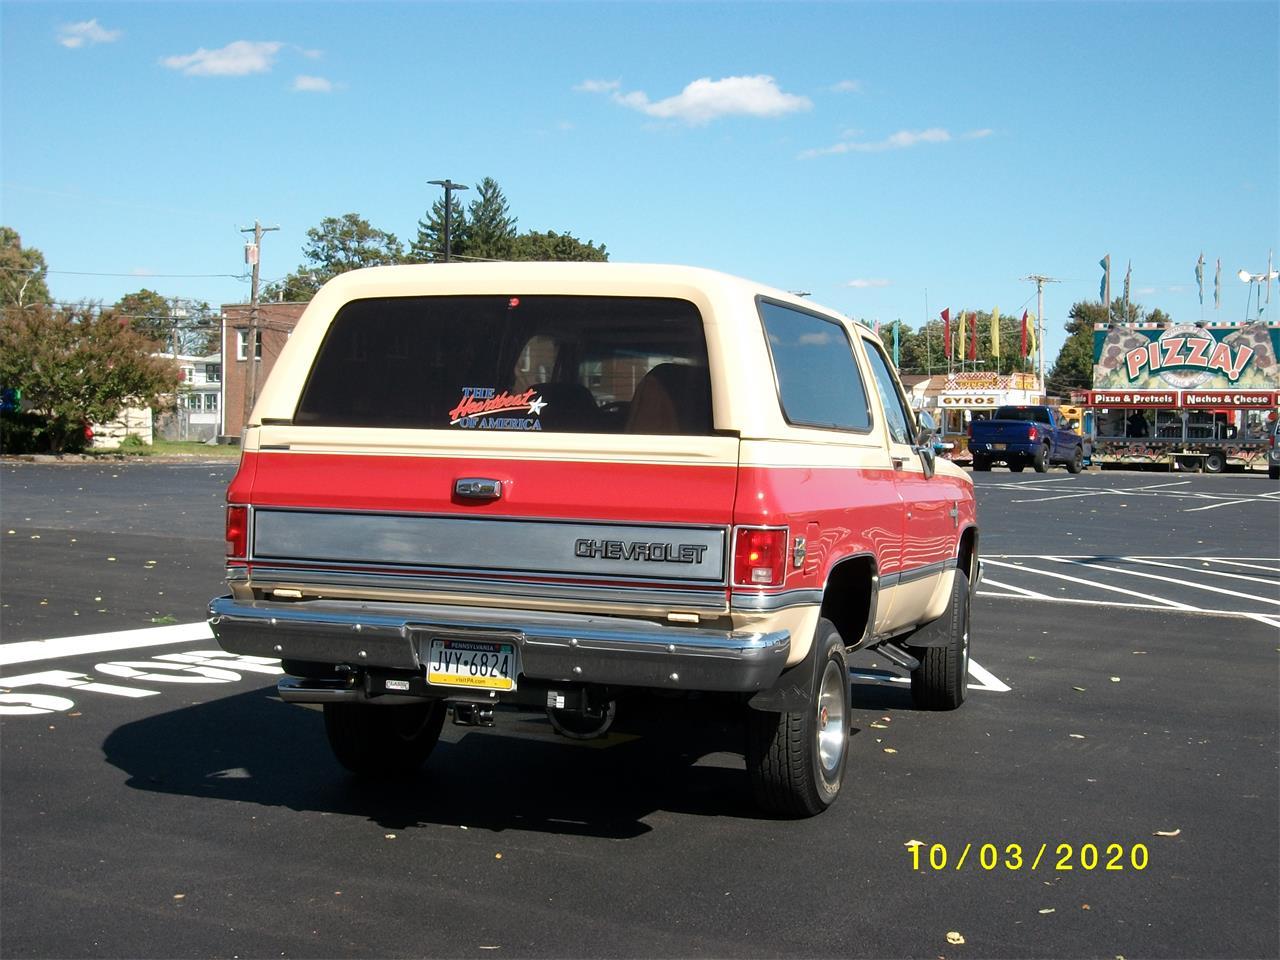 1988 Chevrolet Blazer (CC-1412364) for sale in Essington, Pennslyvania